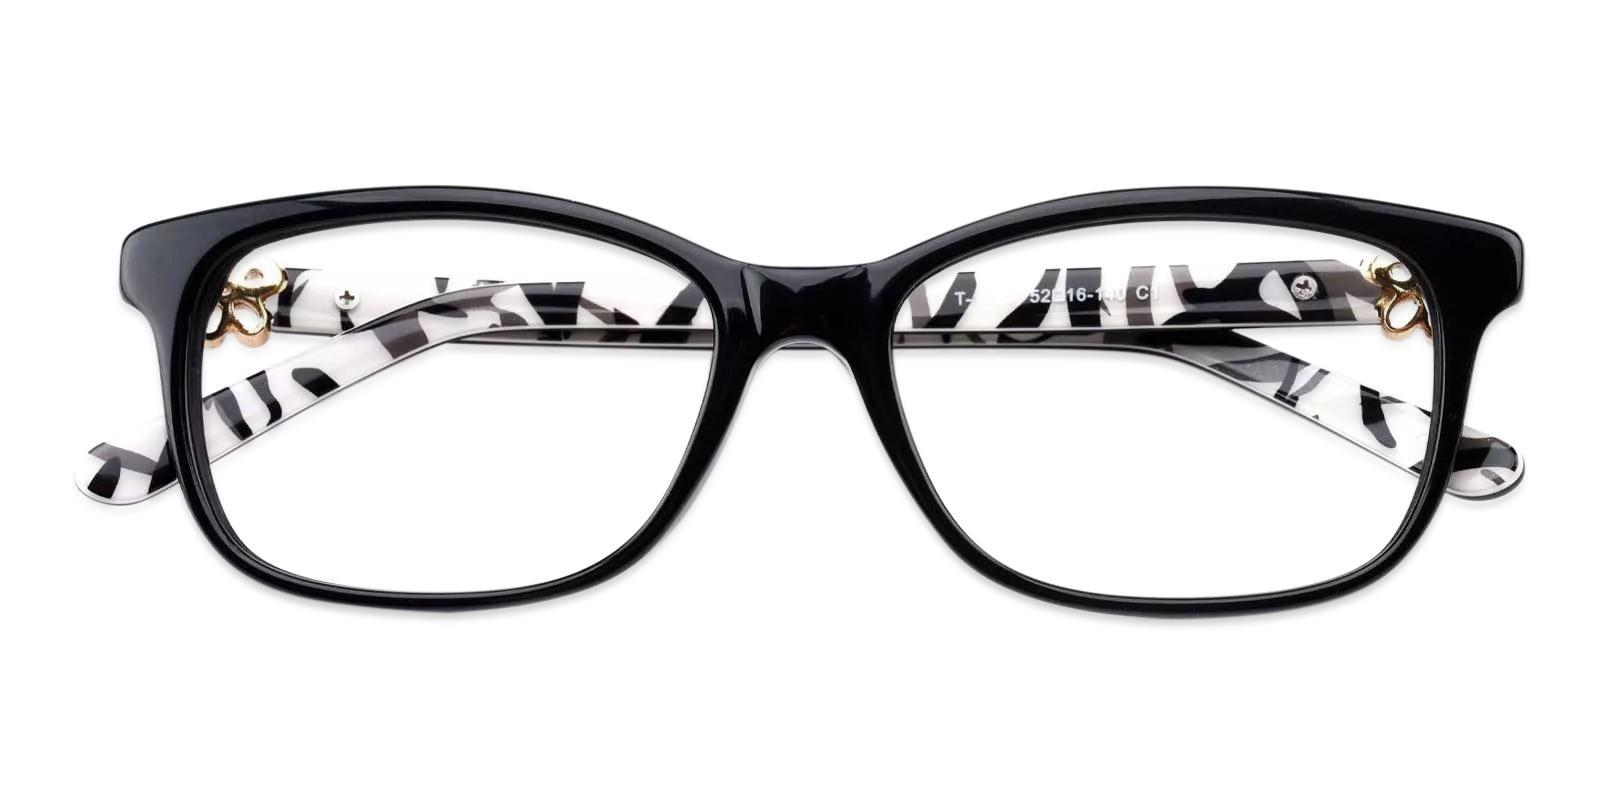 Paula Striped Acetate Eyeglasses , Fashion , UniversalBridgeFit Frames from ABBE Glasses